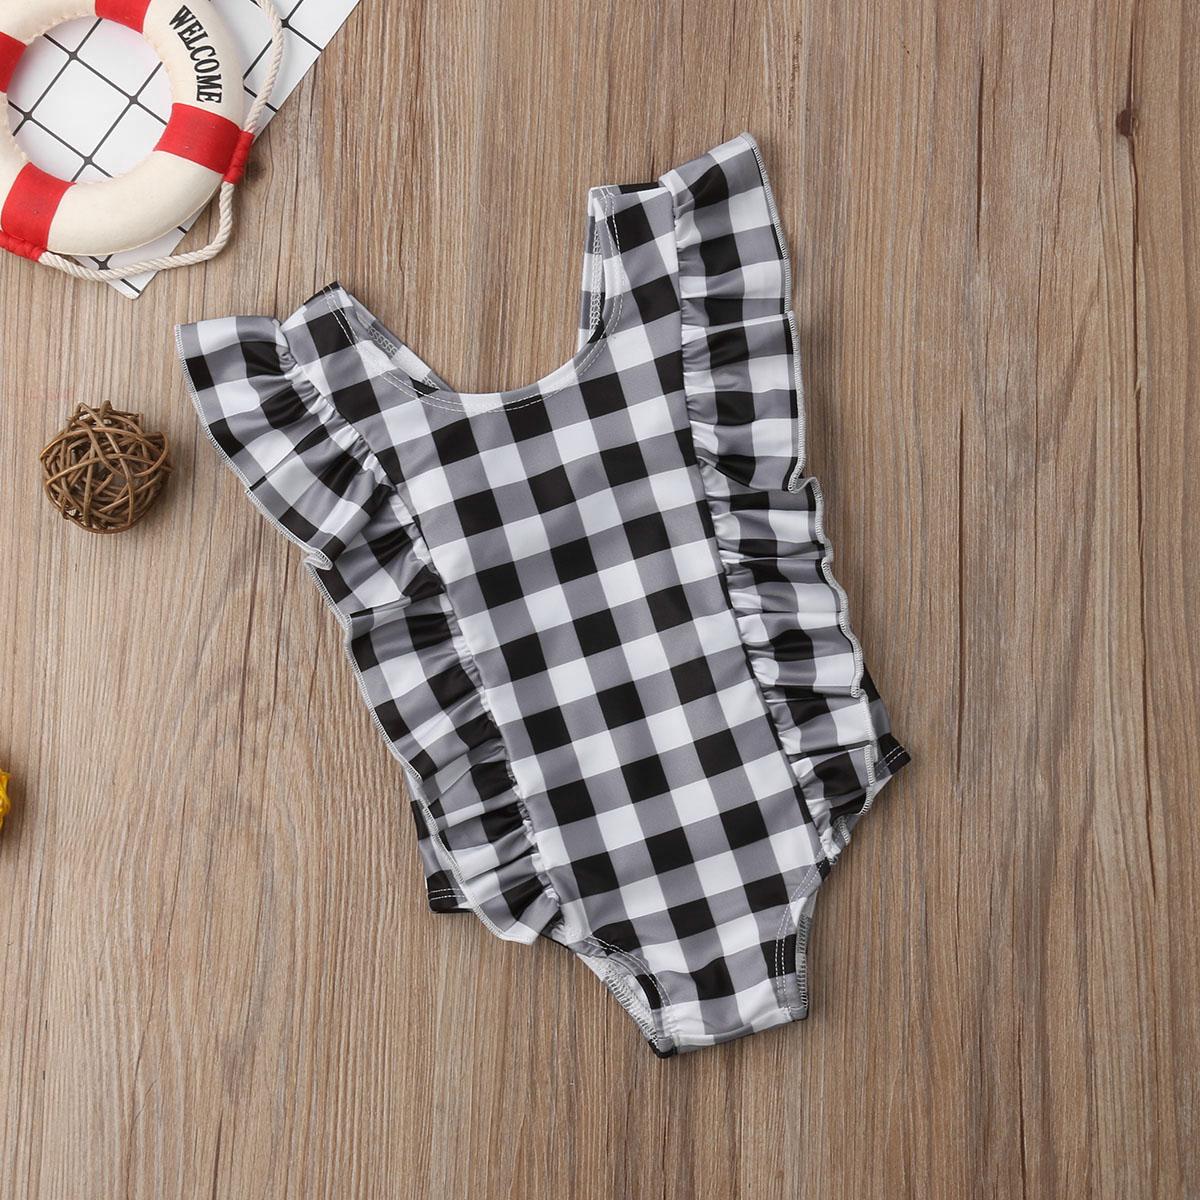 Newborn Toddler Baby Girl Swimwear Ruffle Plaid One Piece Swimsuit Black Bathing Suit Swiming Suit